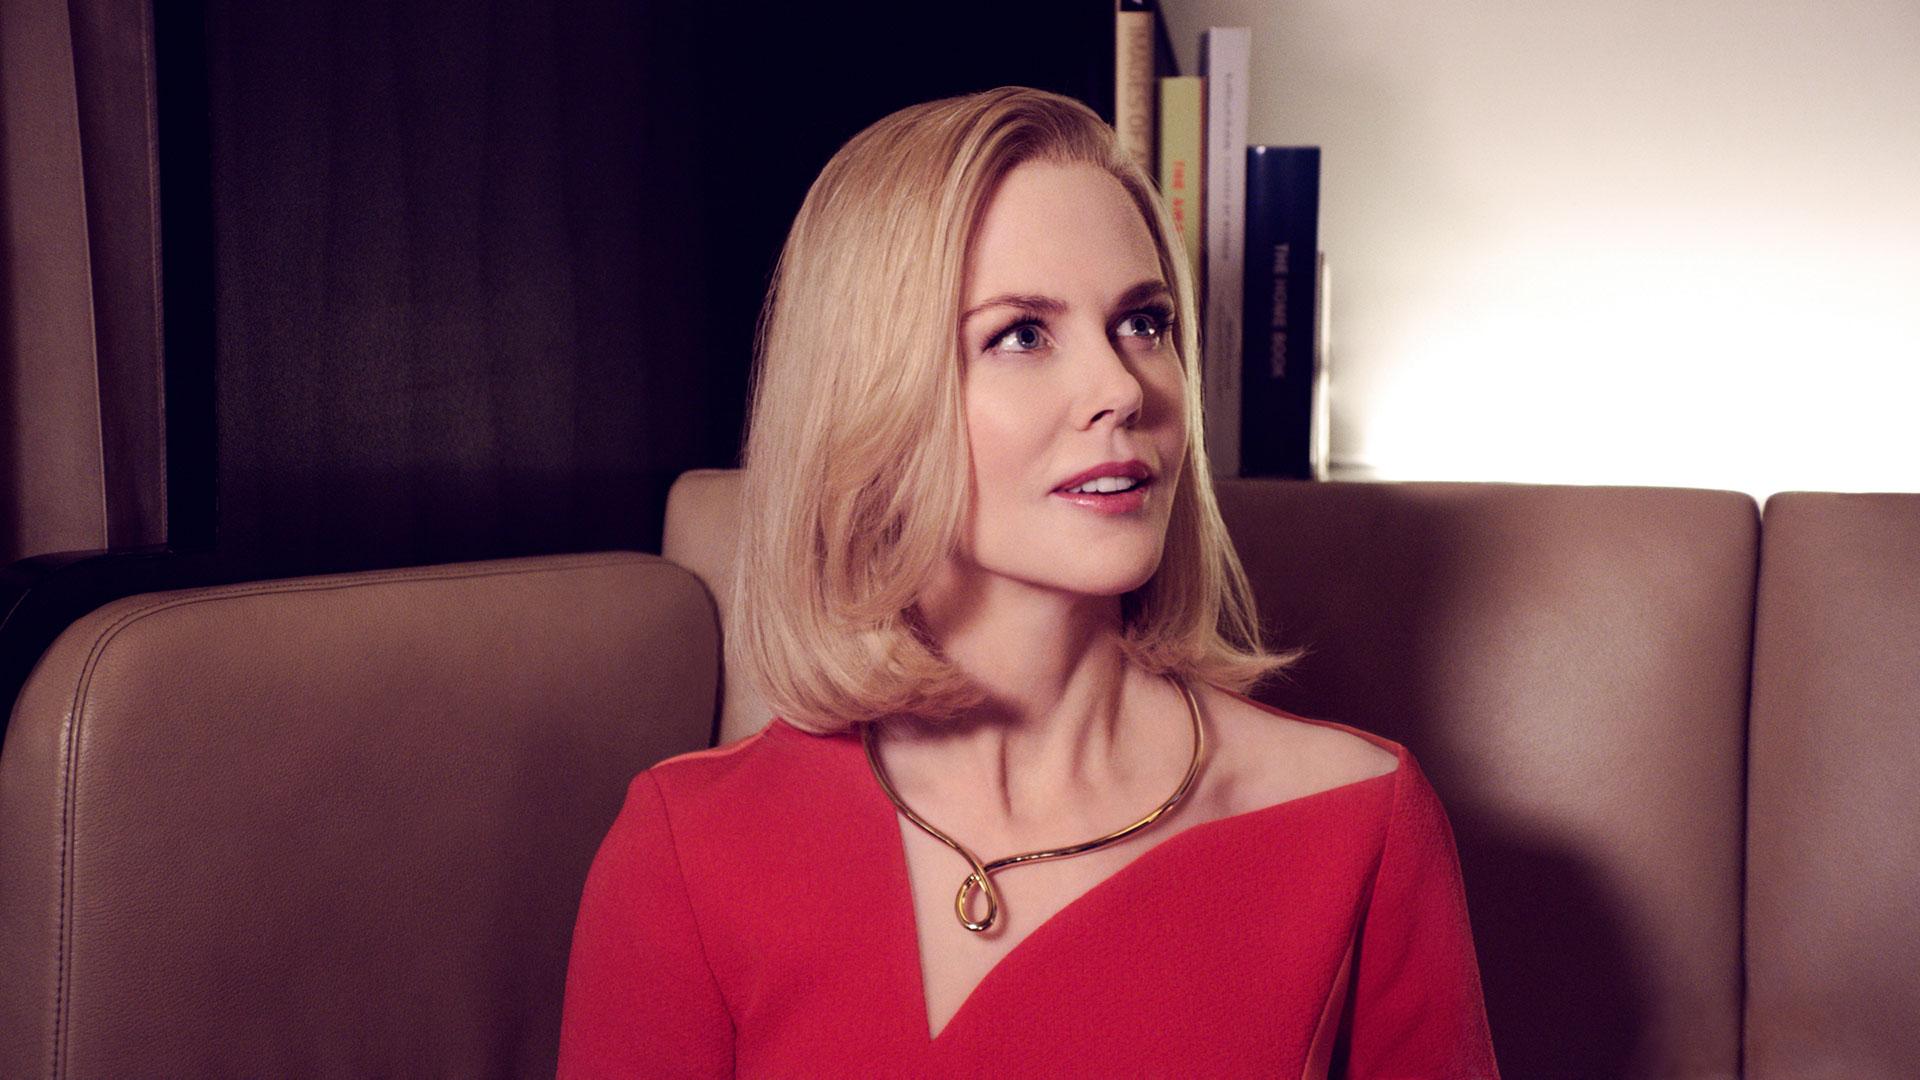 Inside Nicole Kidman's New VR Film That Shows Off a Luxurious Etihad Airways Jet